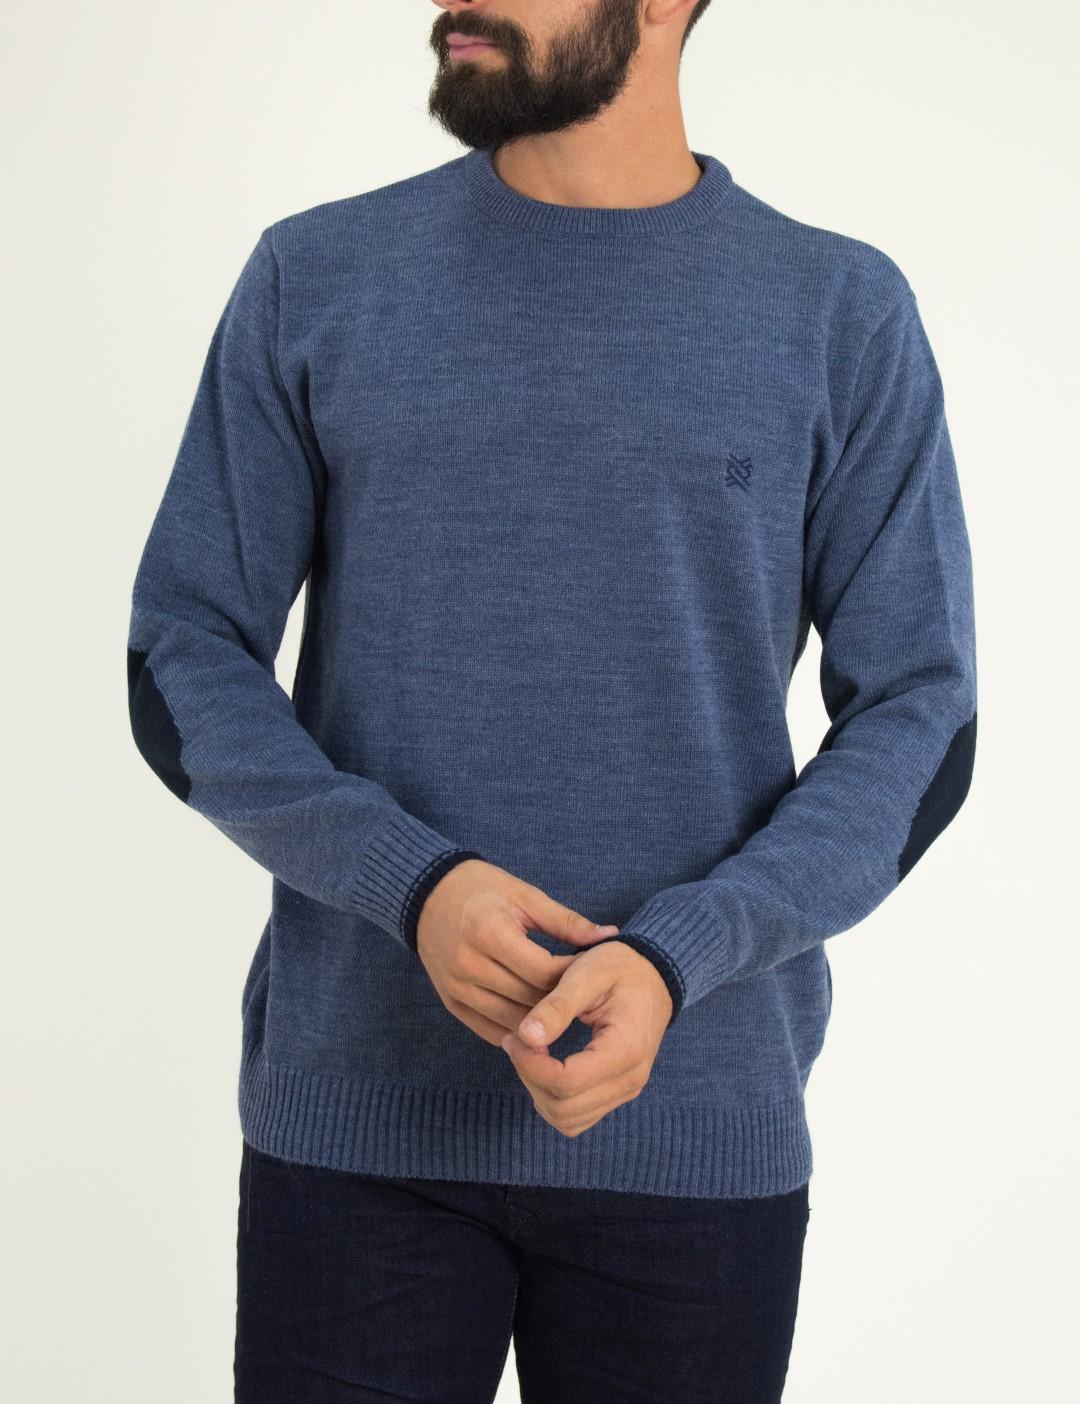 2518f7cdf2d8 Ανδρικό γαλάζιο πλεκτό πουλόβερ με διχρωμία Darious 18555F